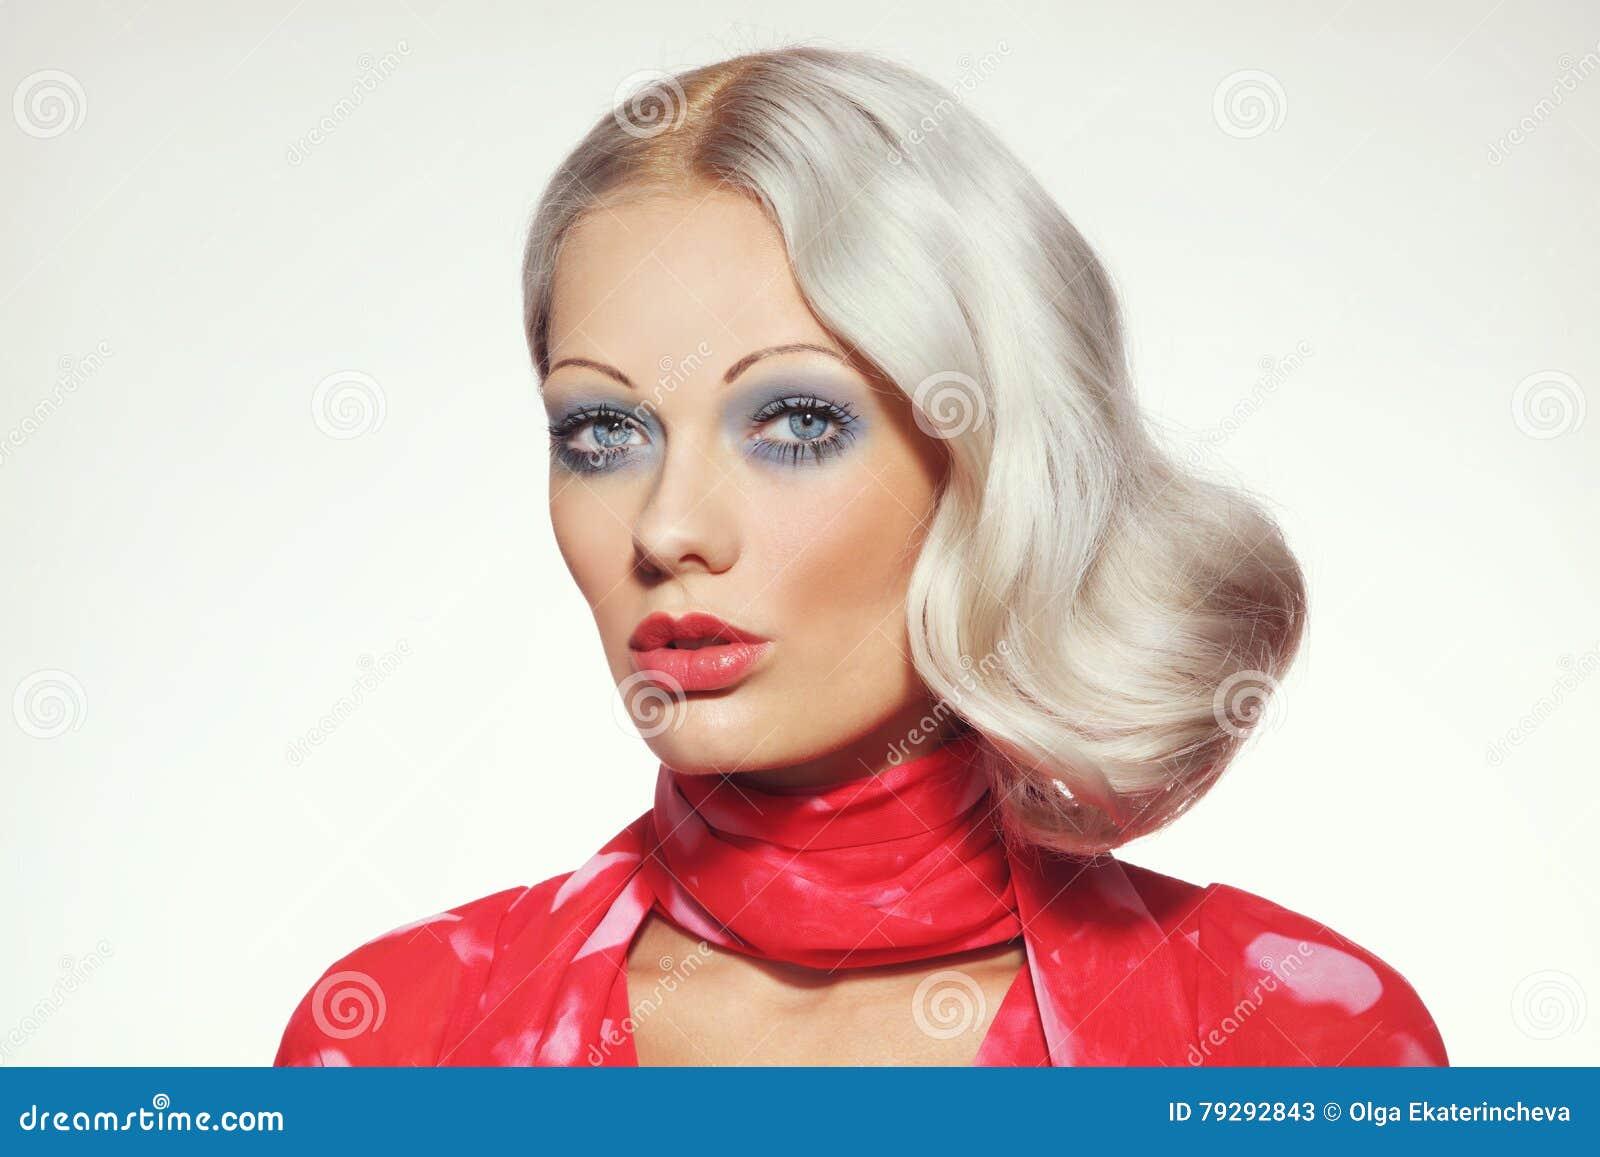 70s Beauty Stock Image Image Of Blue Fashion Permanent 79292843